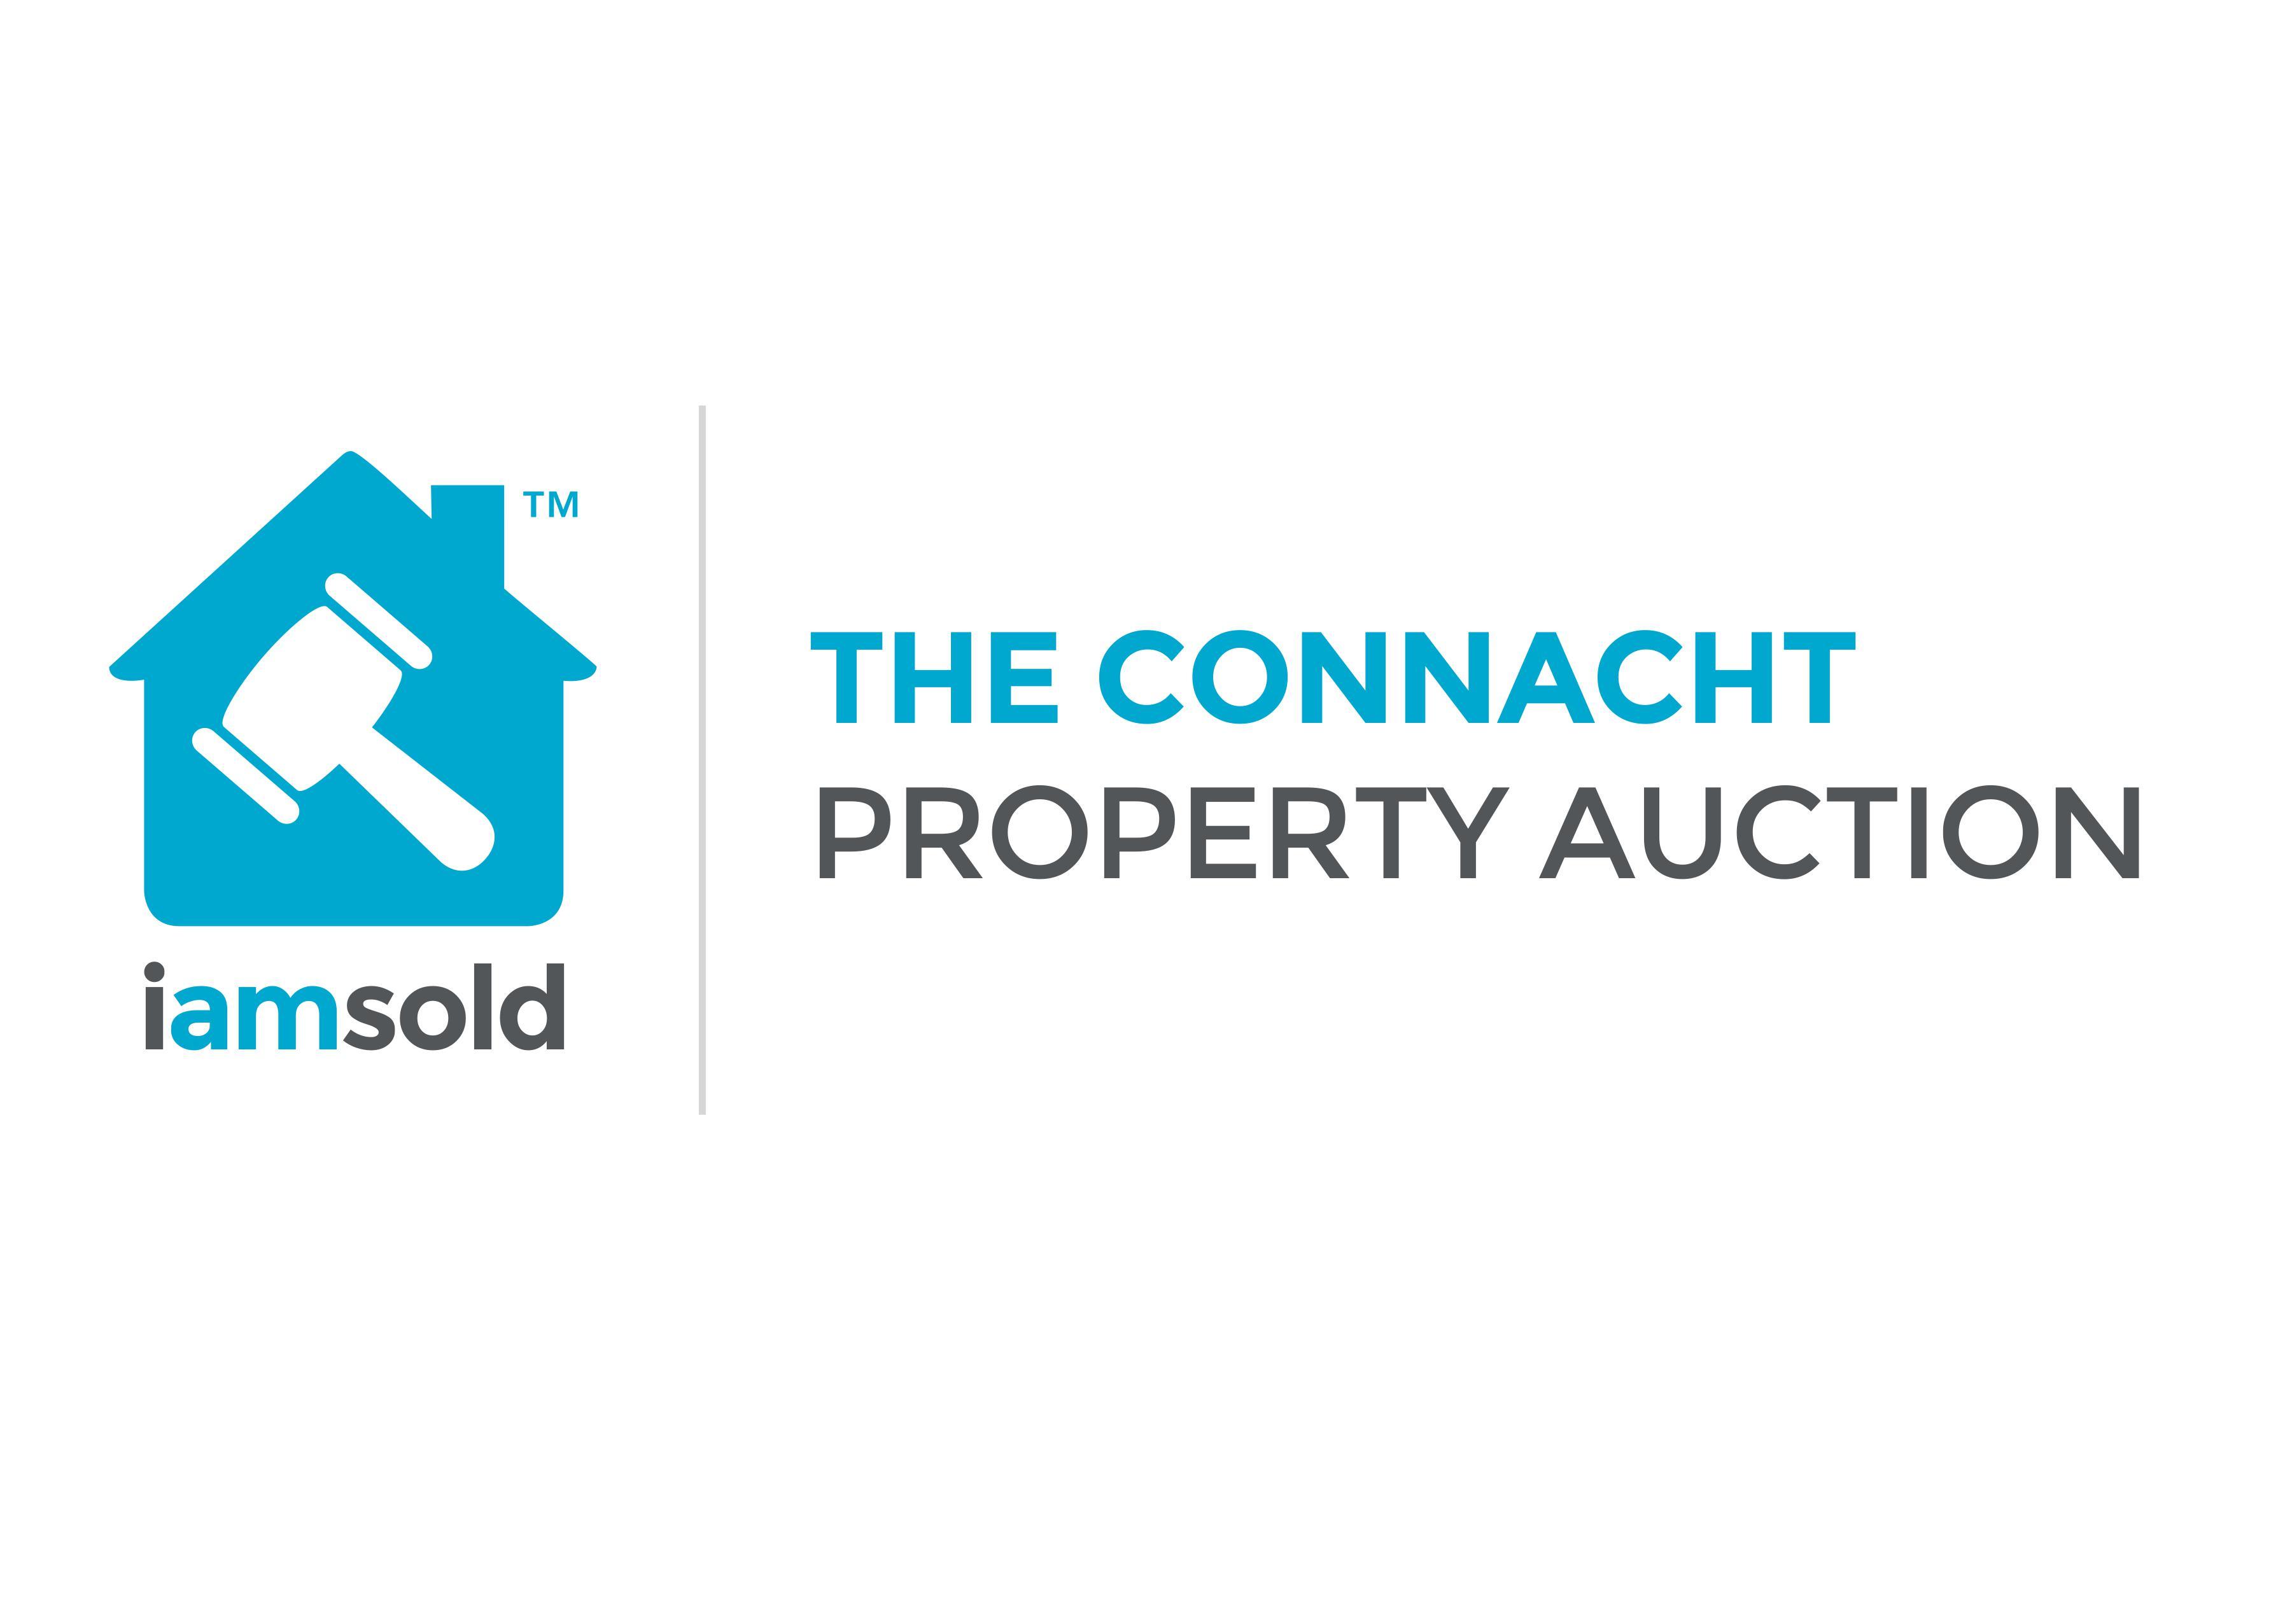 The Connacht Property Auction